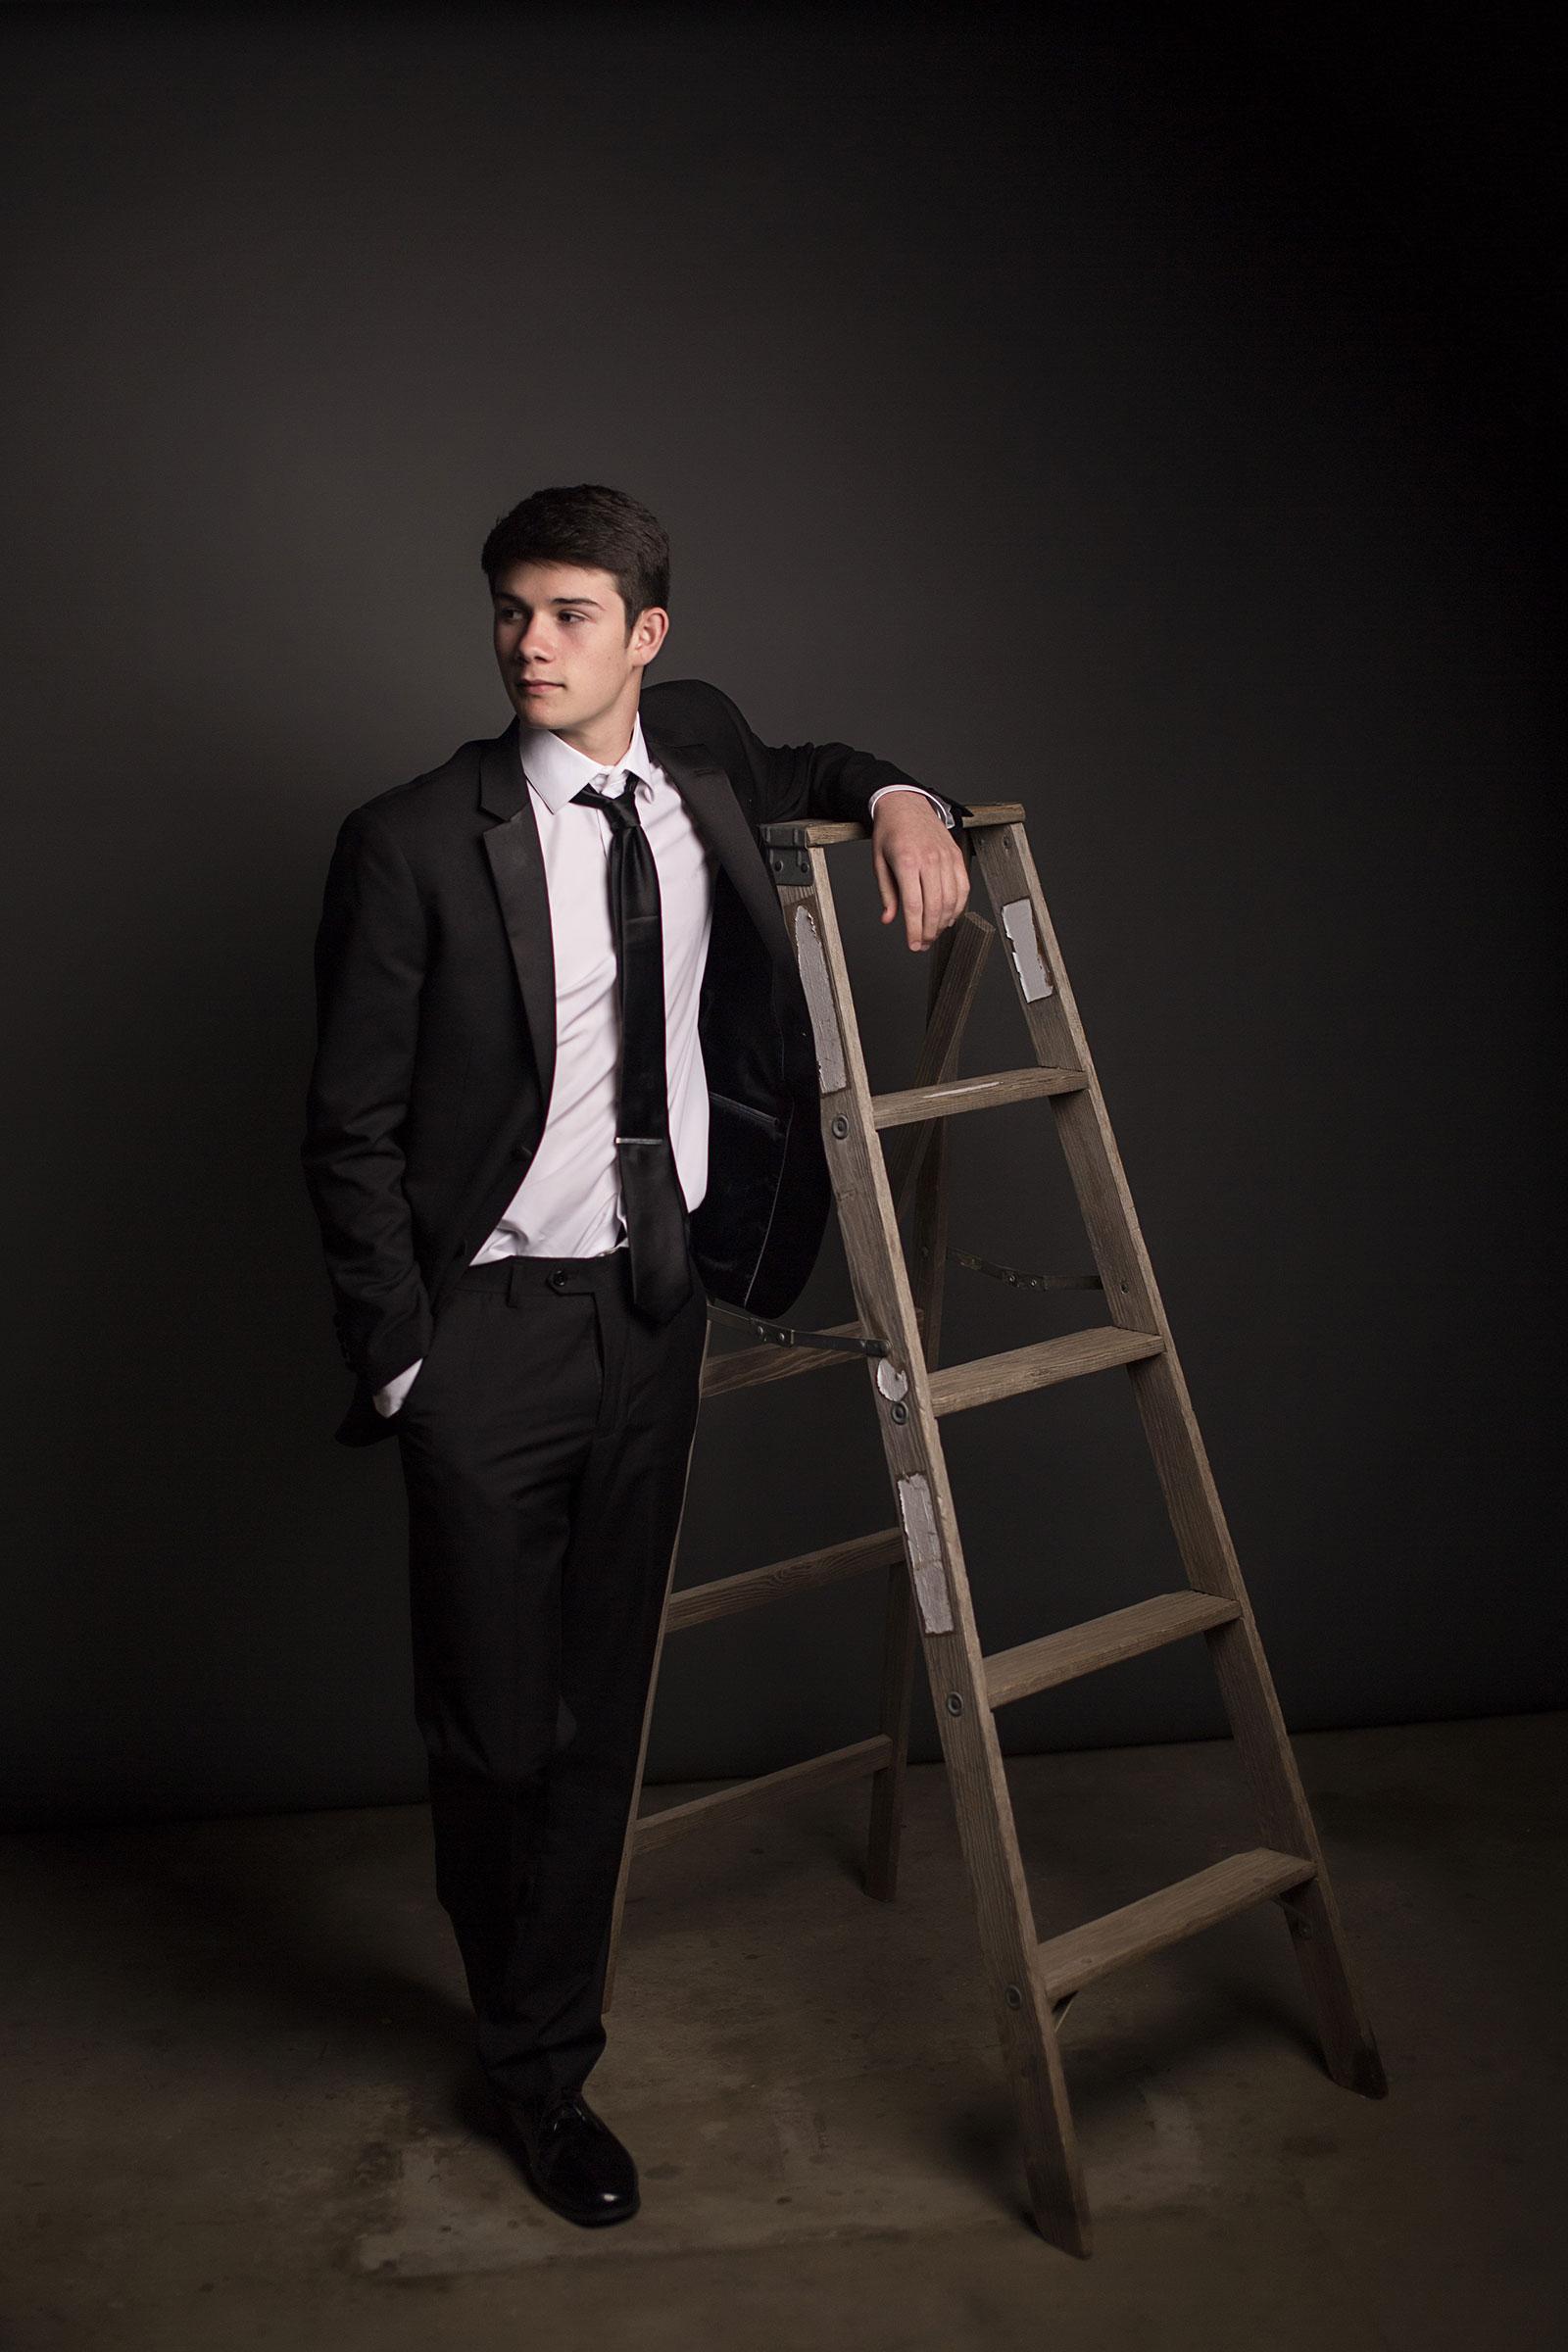 Arkansas Senior Portrait Photographer